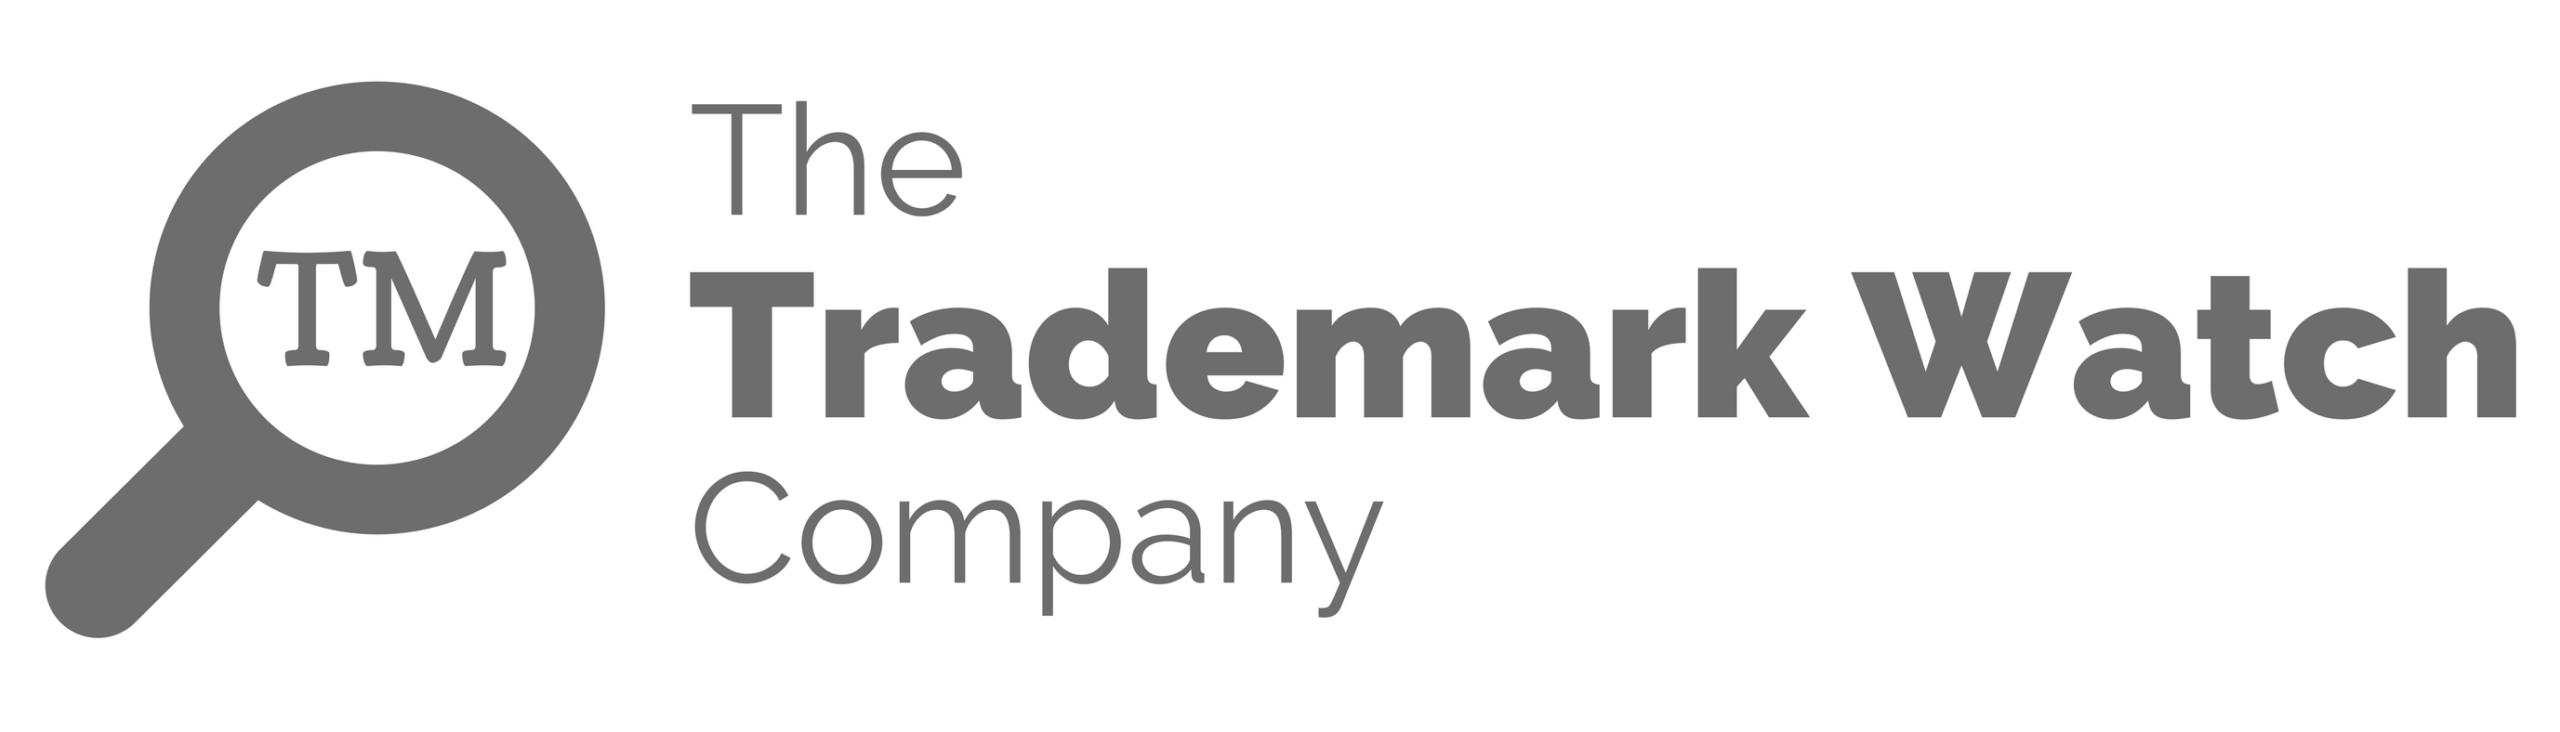 Trademark fundamentals for start ups the trademark watch company buycottarizona Choice Image